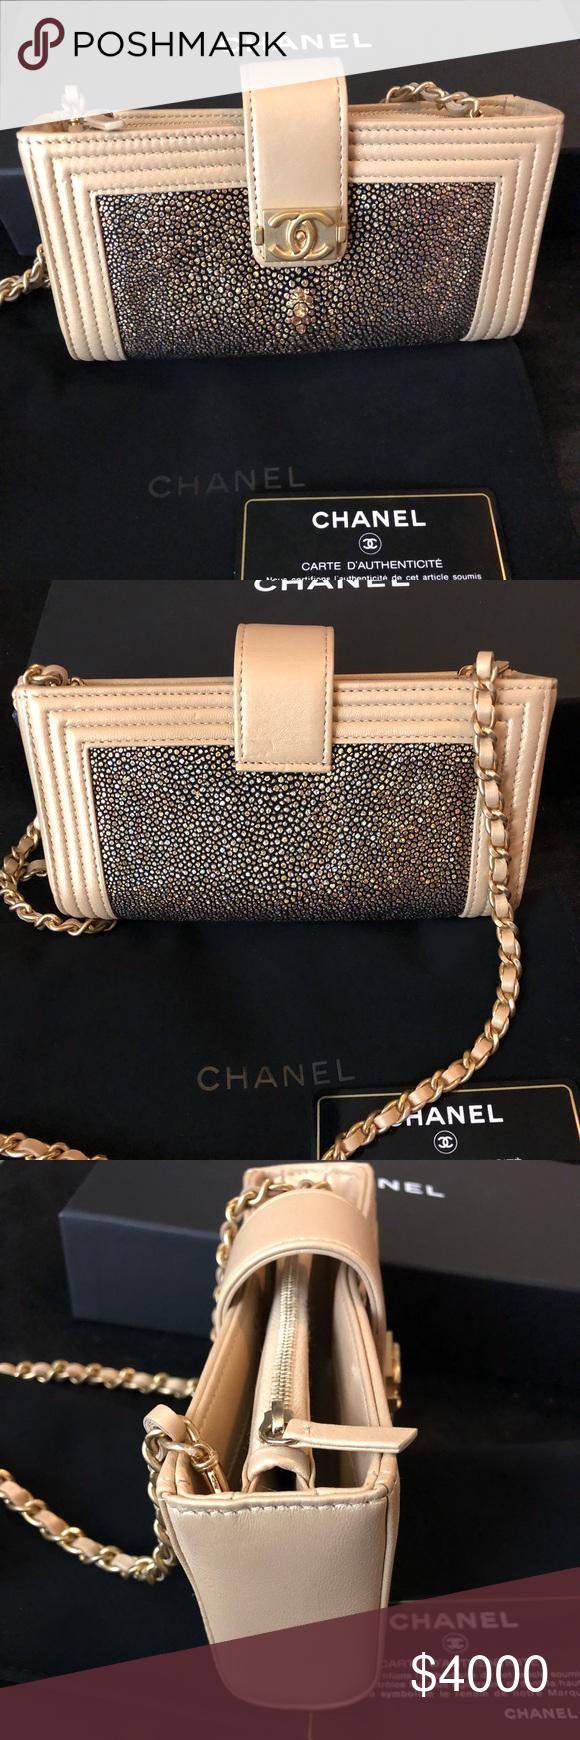 62471341537c05 CHANEL Le Boy Stingray Pochette Wallet on Chain Chanel BRAND NEW & RARE  NWOT 100